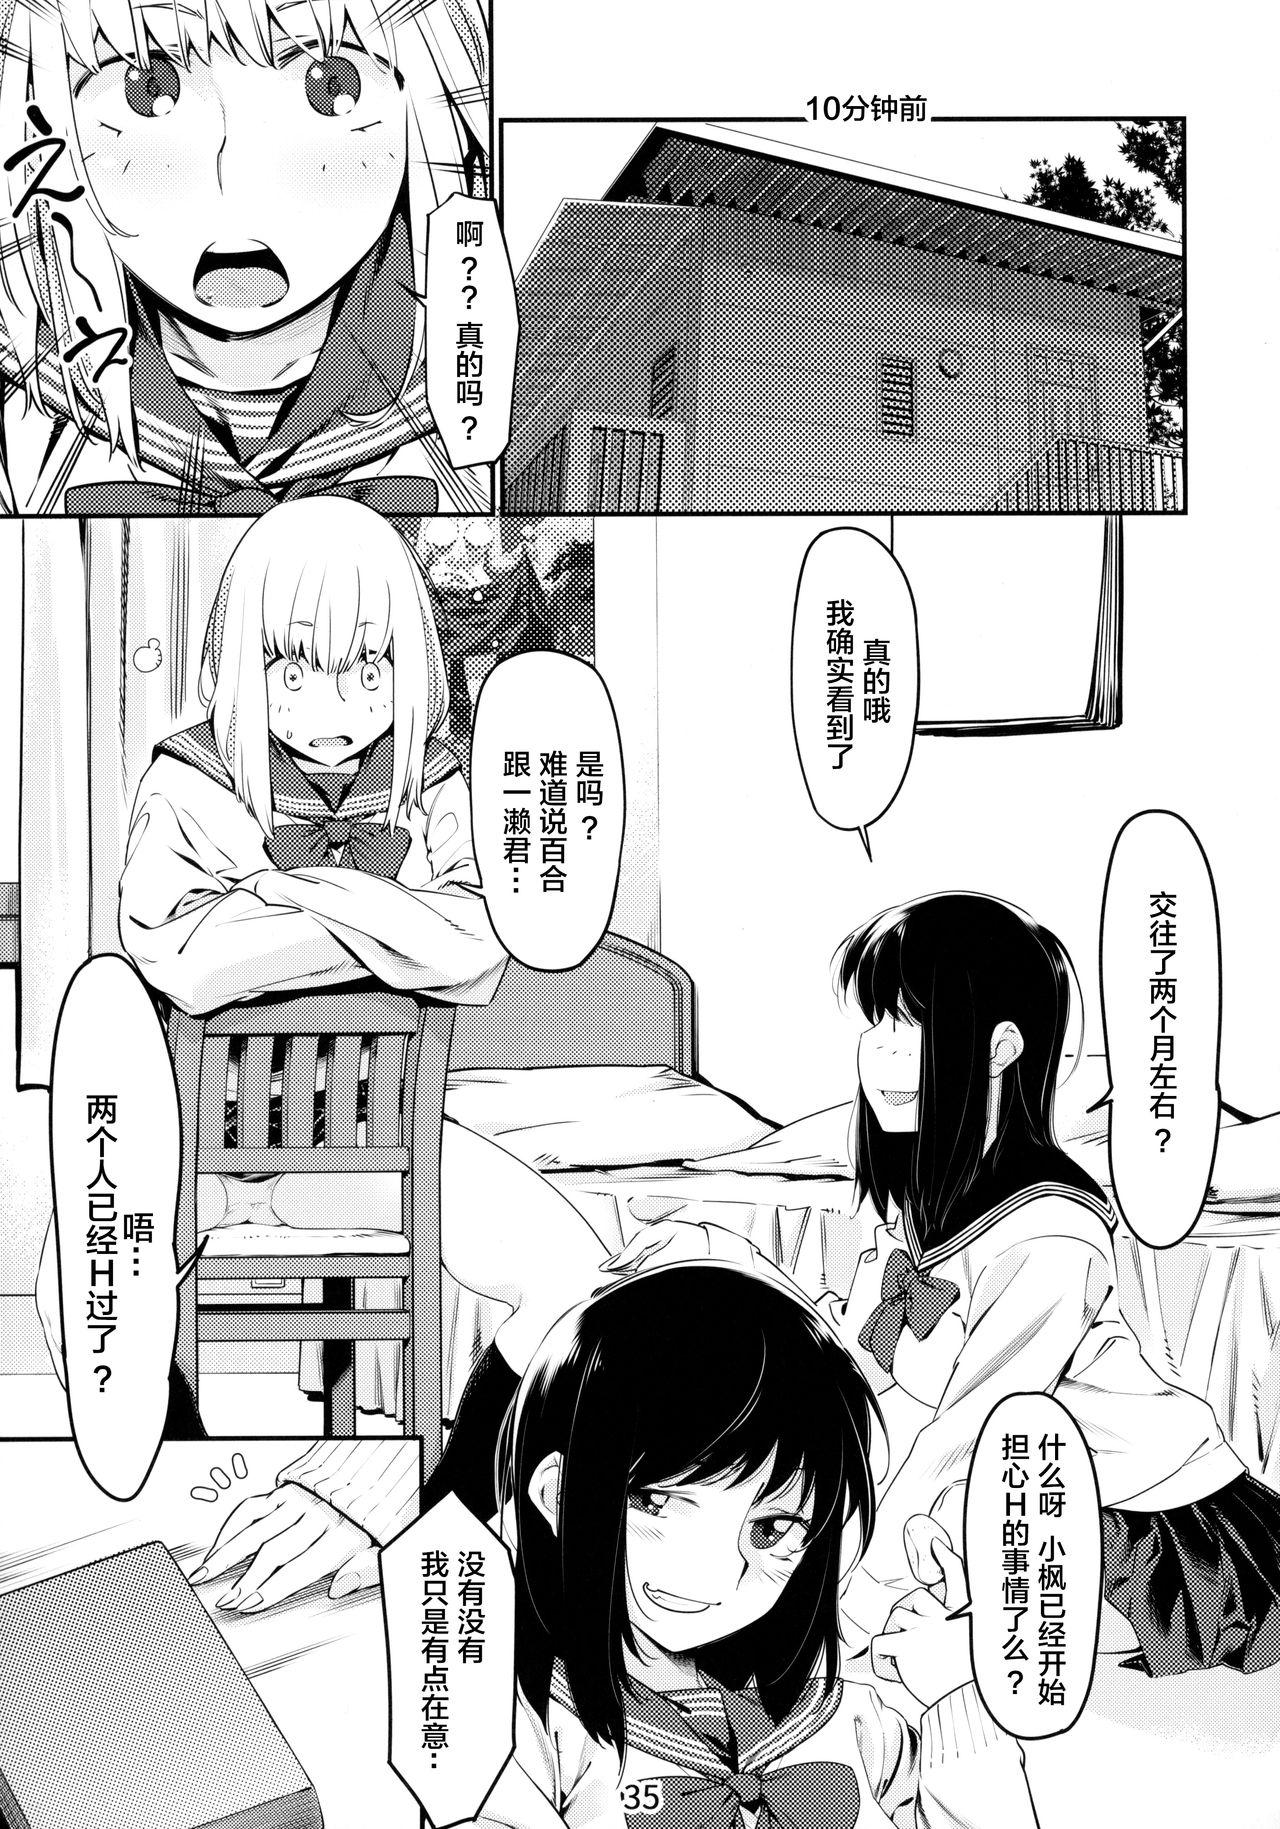 Otonano Omochiya 6 Kan 34